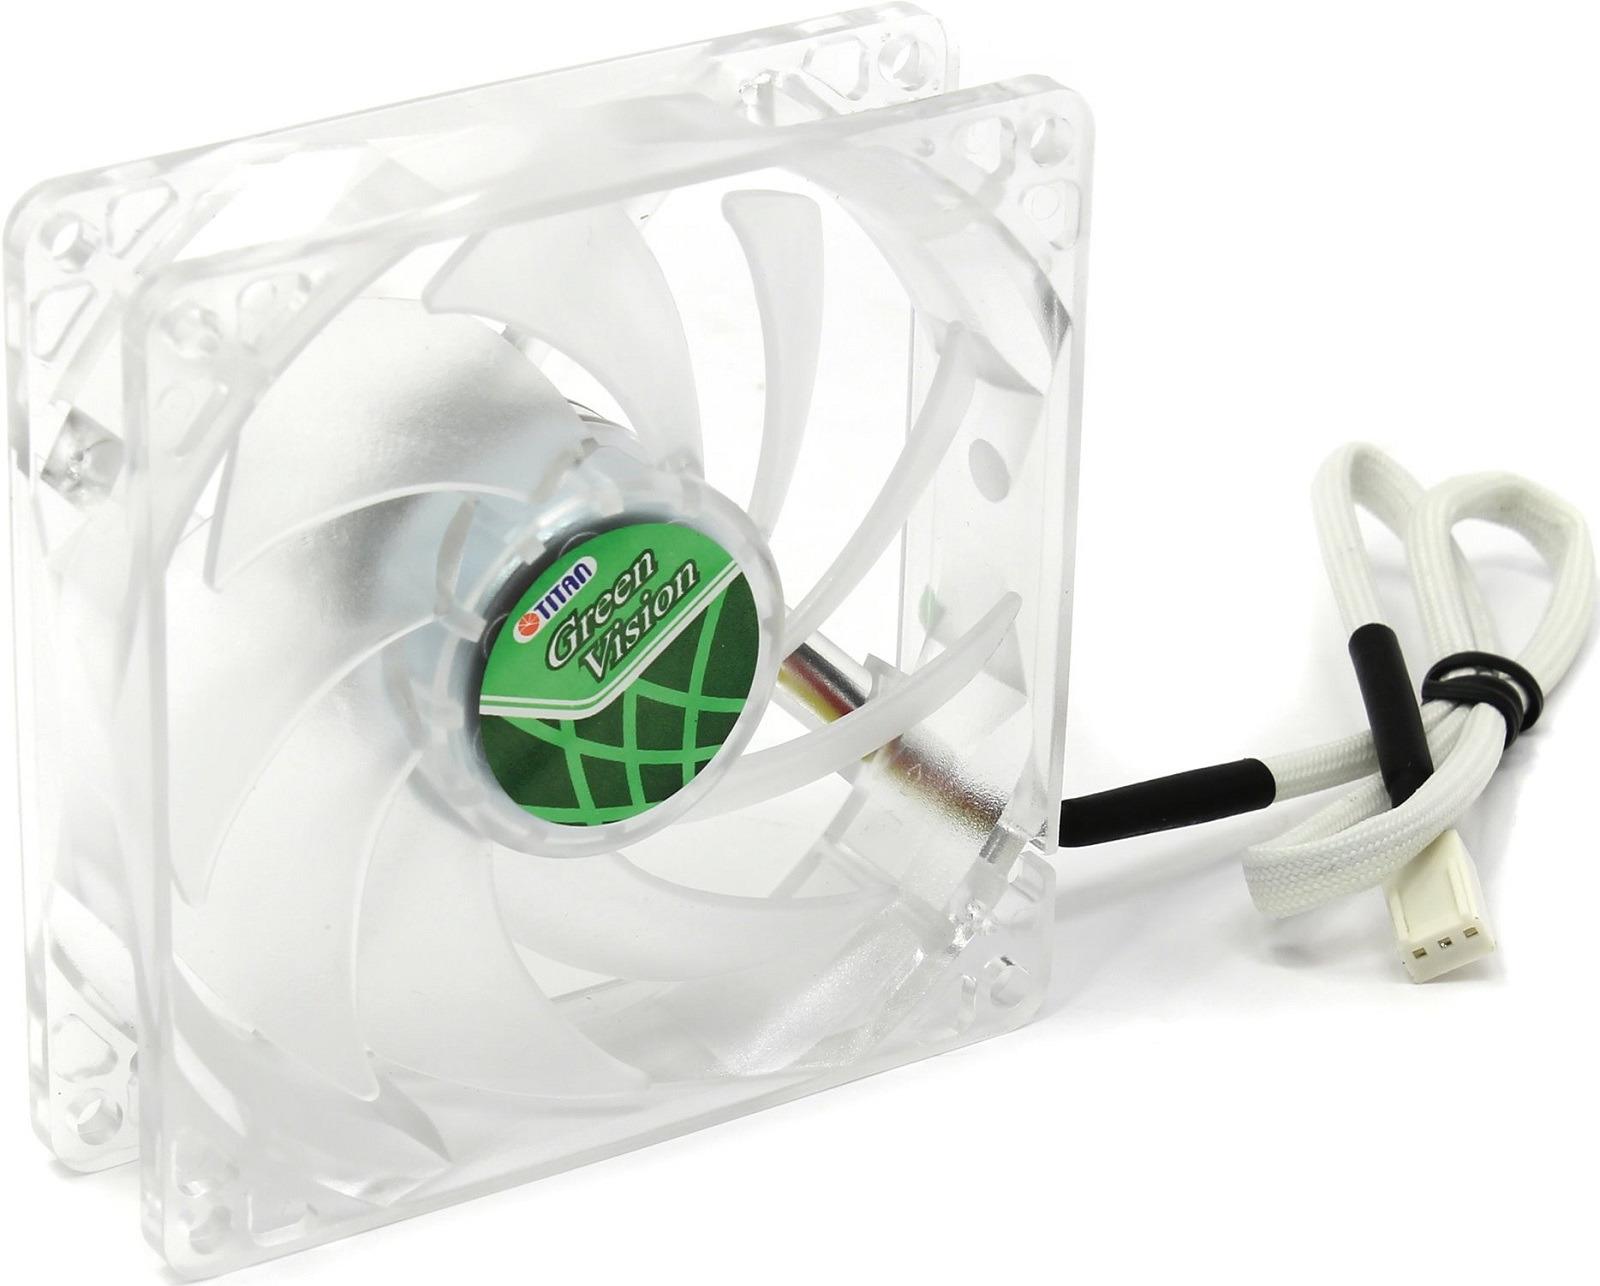 Вентилятор компьютерный Titan, TFD-9225GT12Z